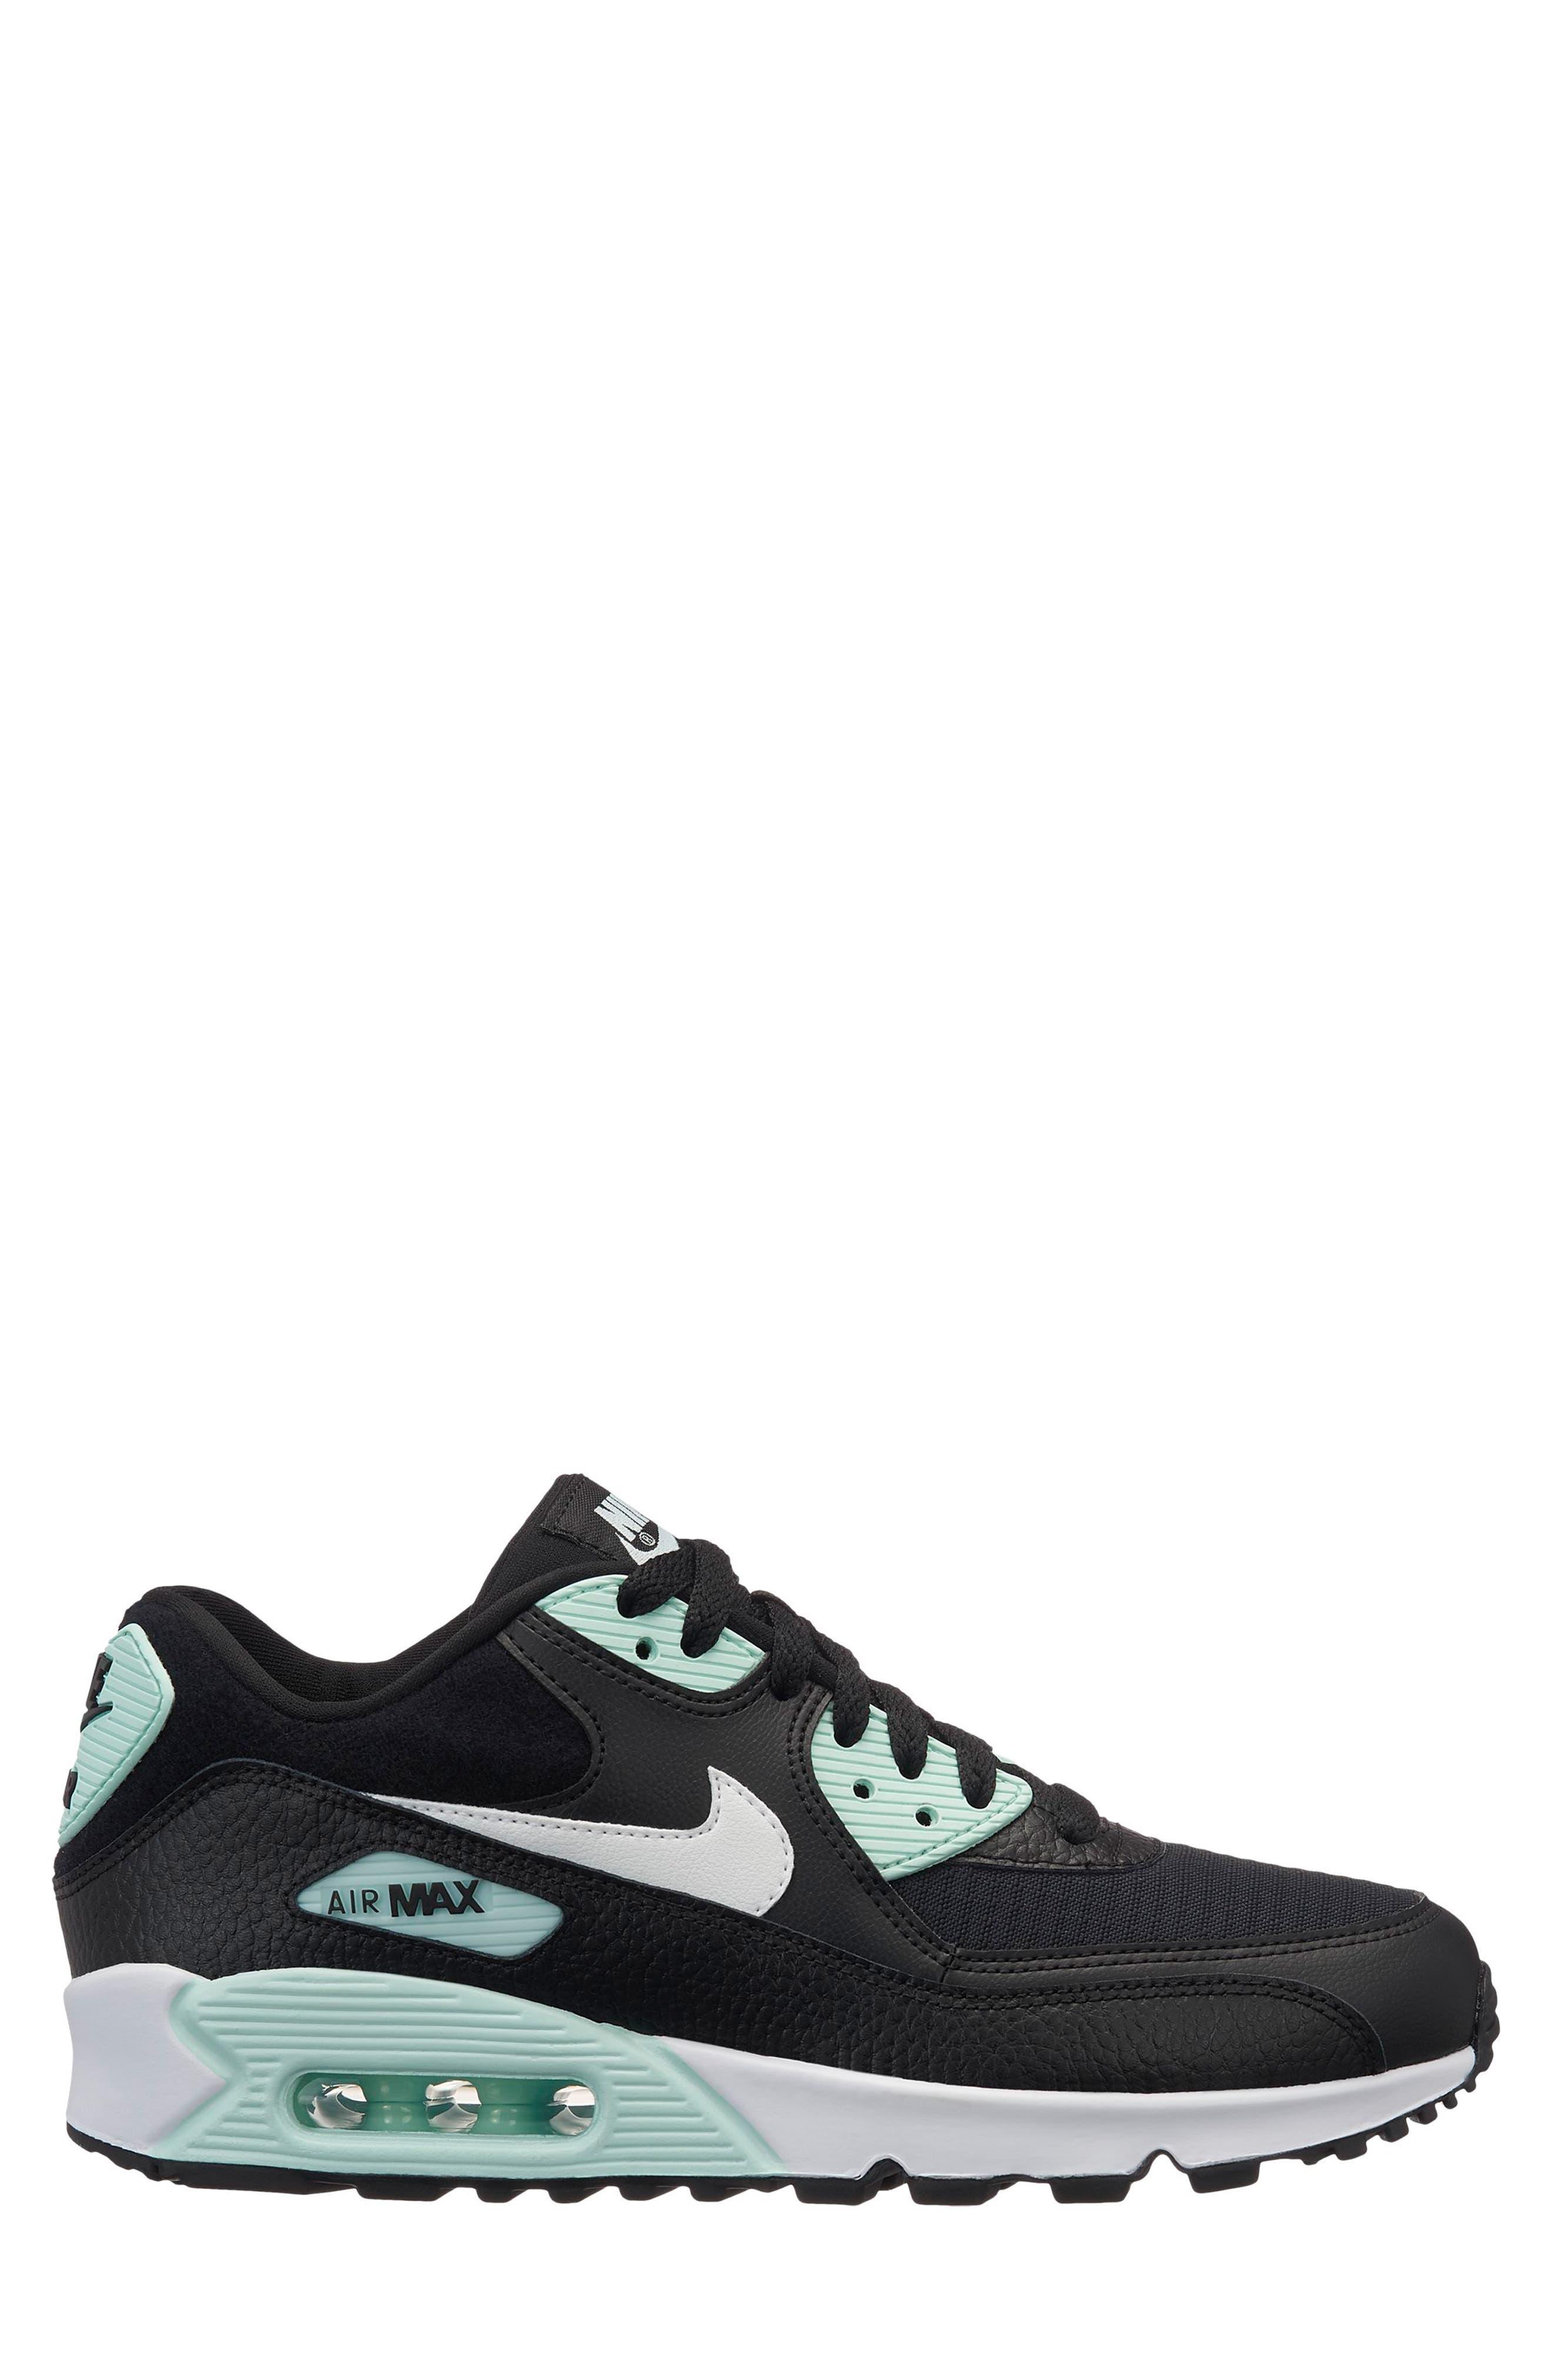 Air Max 90 Sneaker,                             Main thumbnail 1, color,                             BLACK/ SUMMIT WHITE/ IGLOO